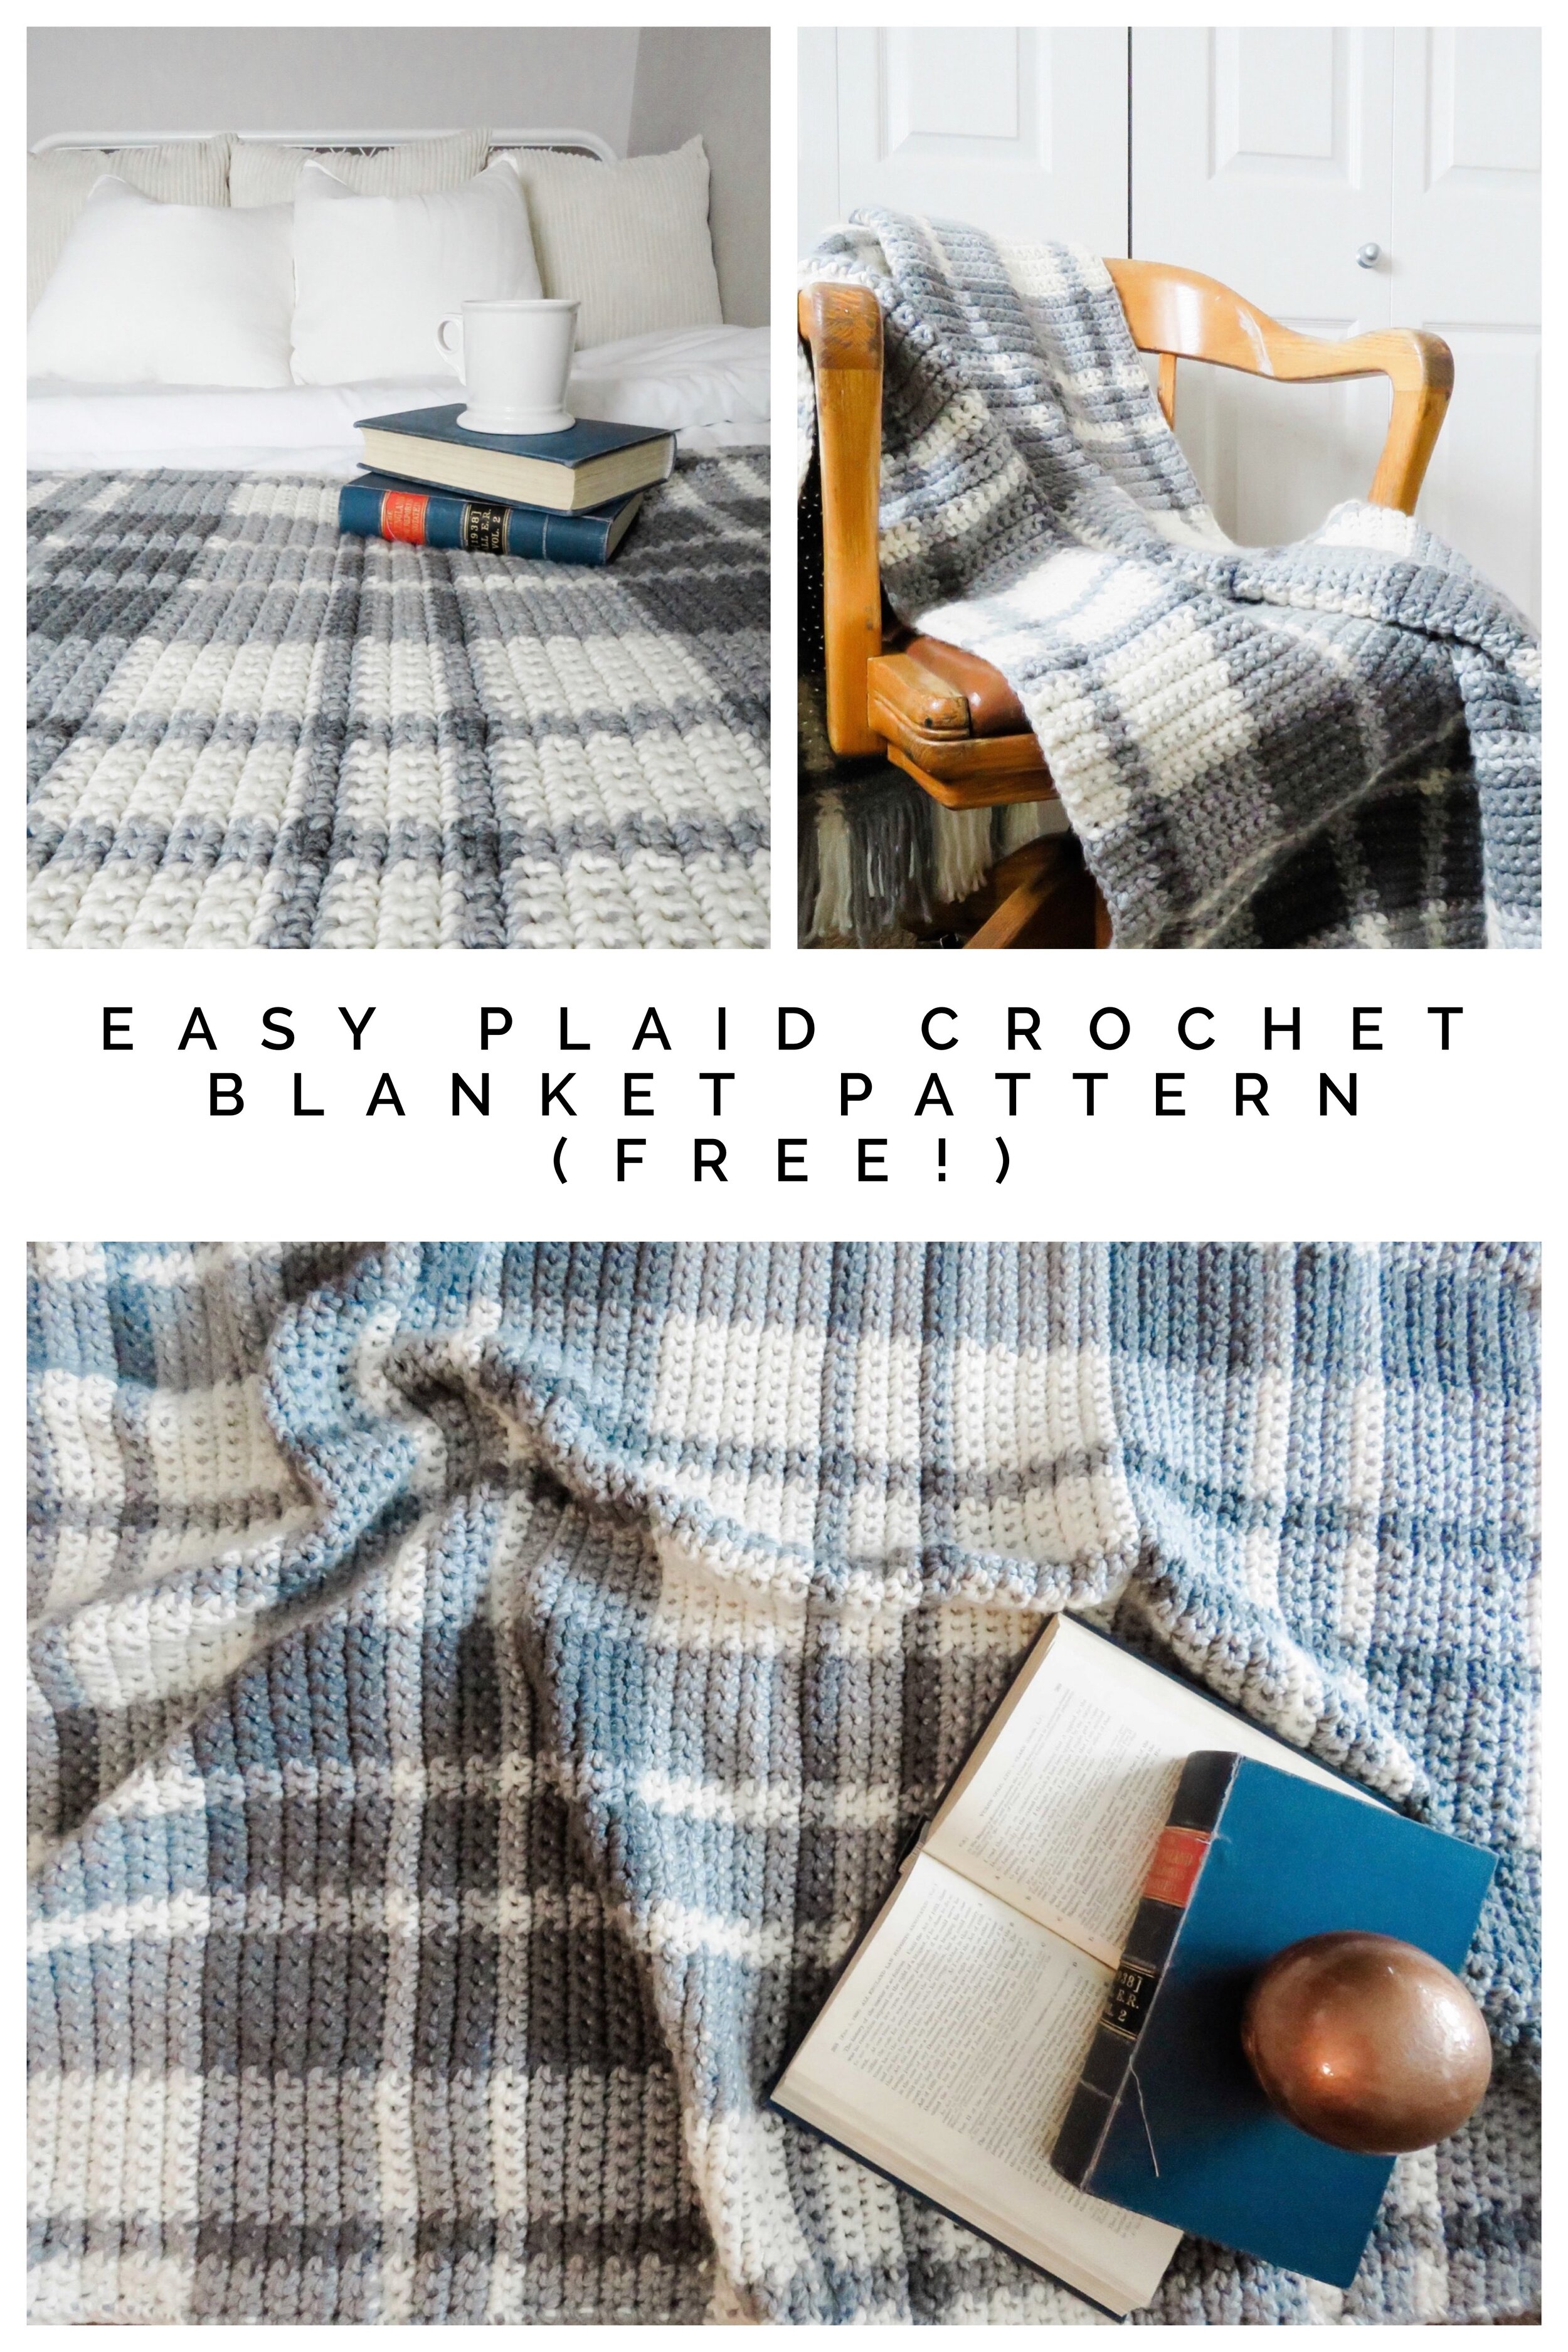 Easy Plaid Crochet Blanket Pattern Free Callista Faye Creative